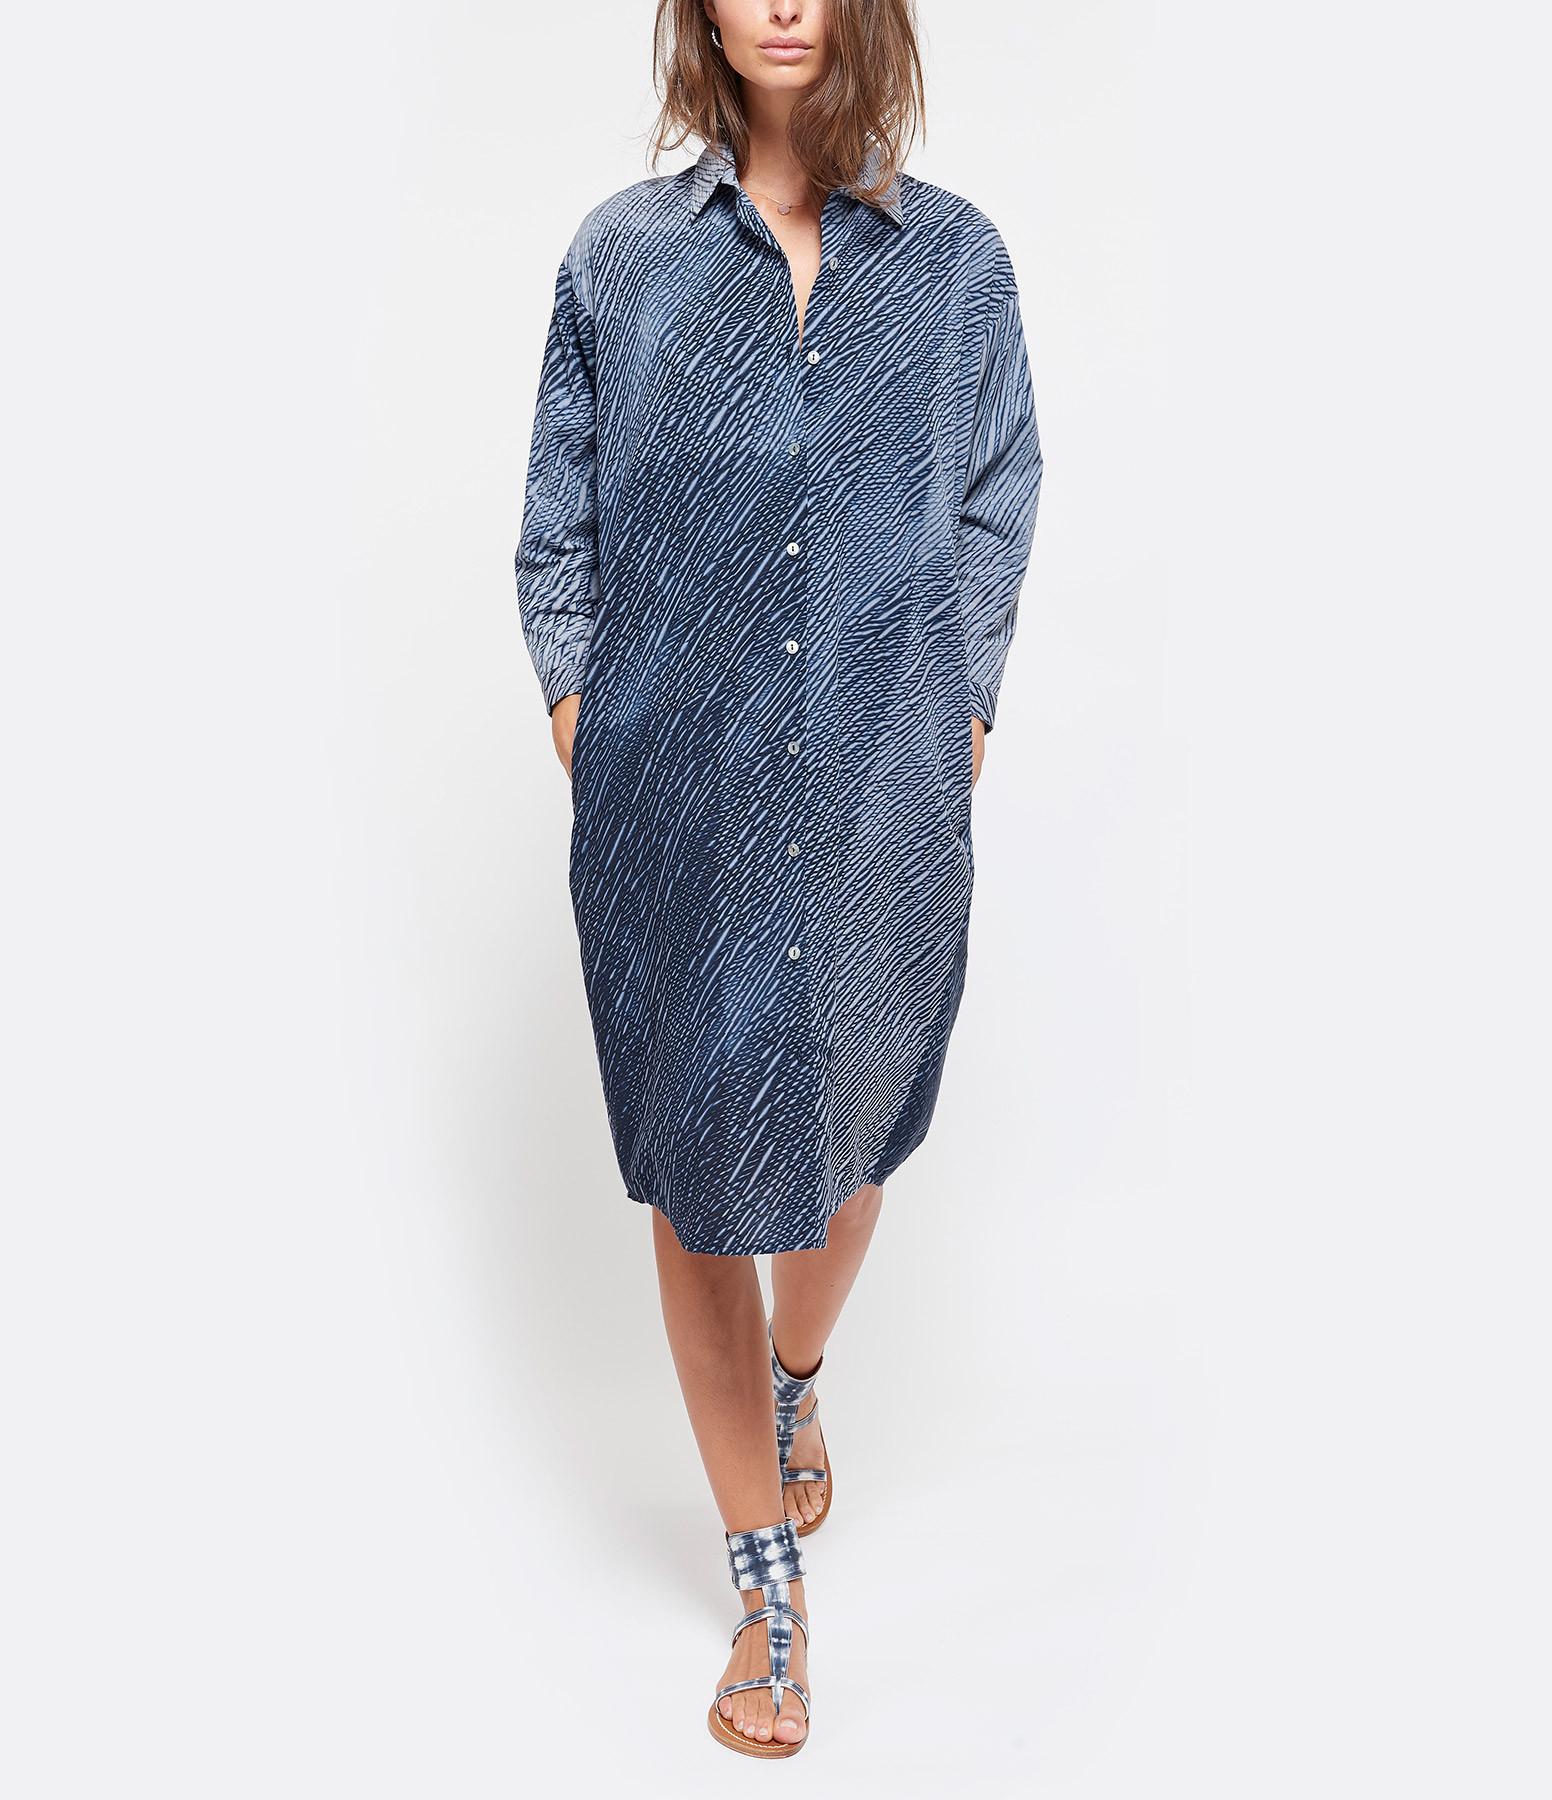 NOUS - Robe Florence Popeline Coton Indigo Blanc